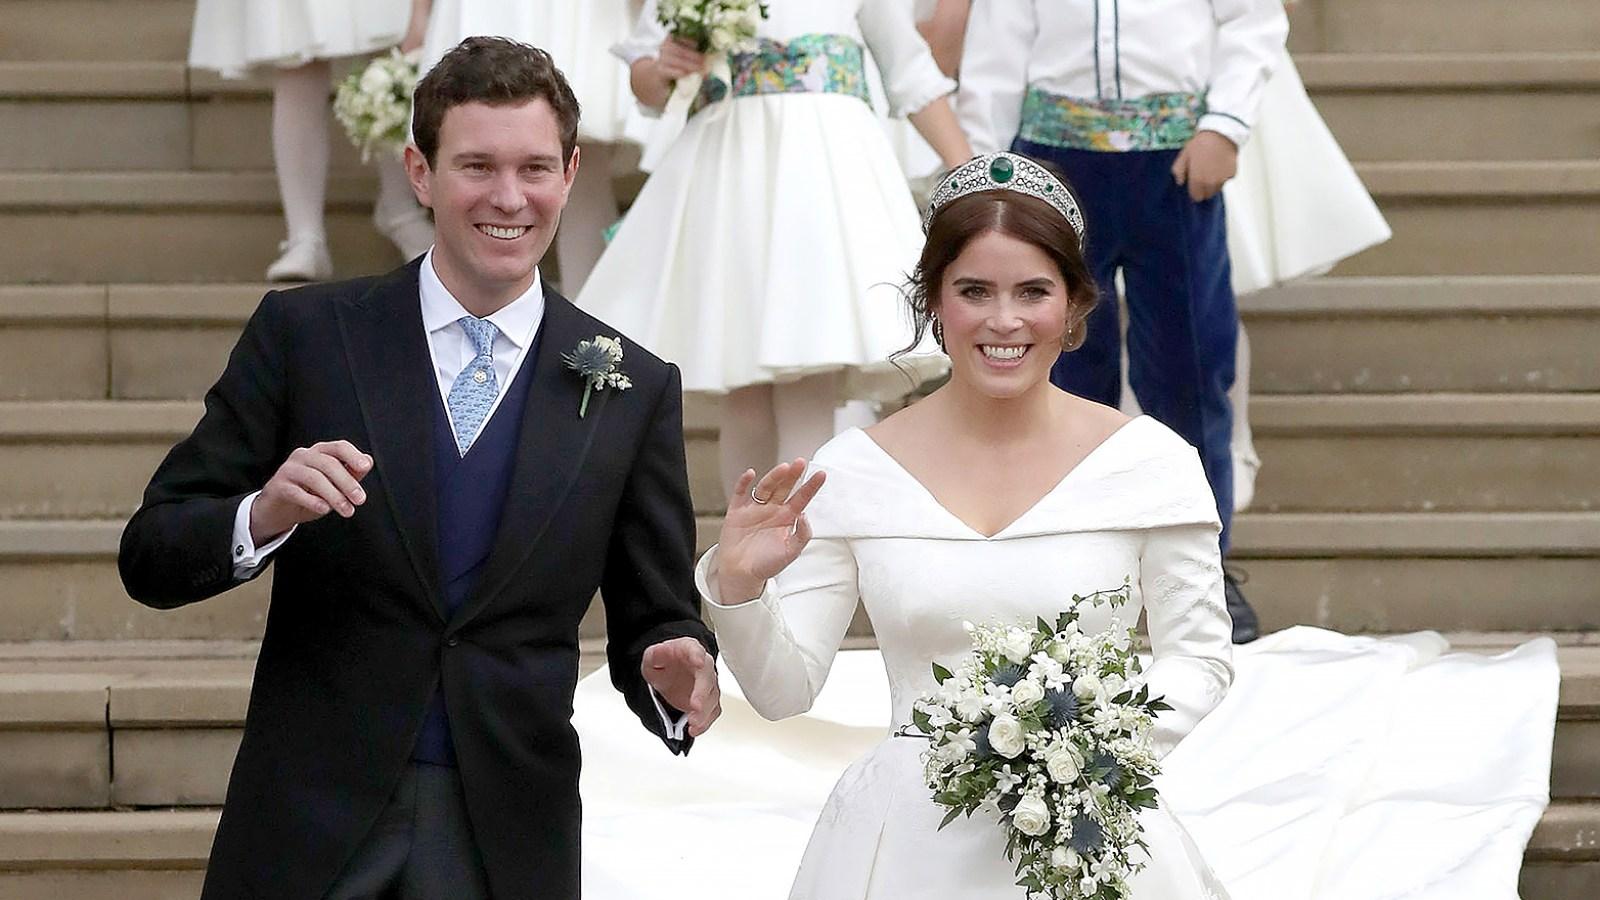 Eugenie Wedding Dress.Princess Eugenie Wears Peter Pilotto Wedding Dress Details